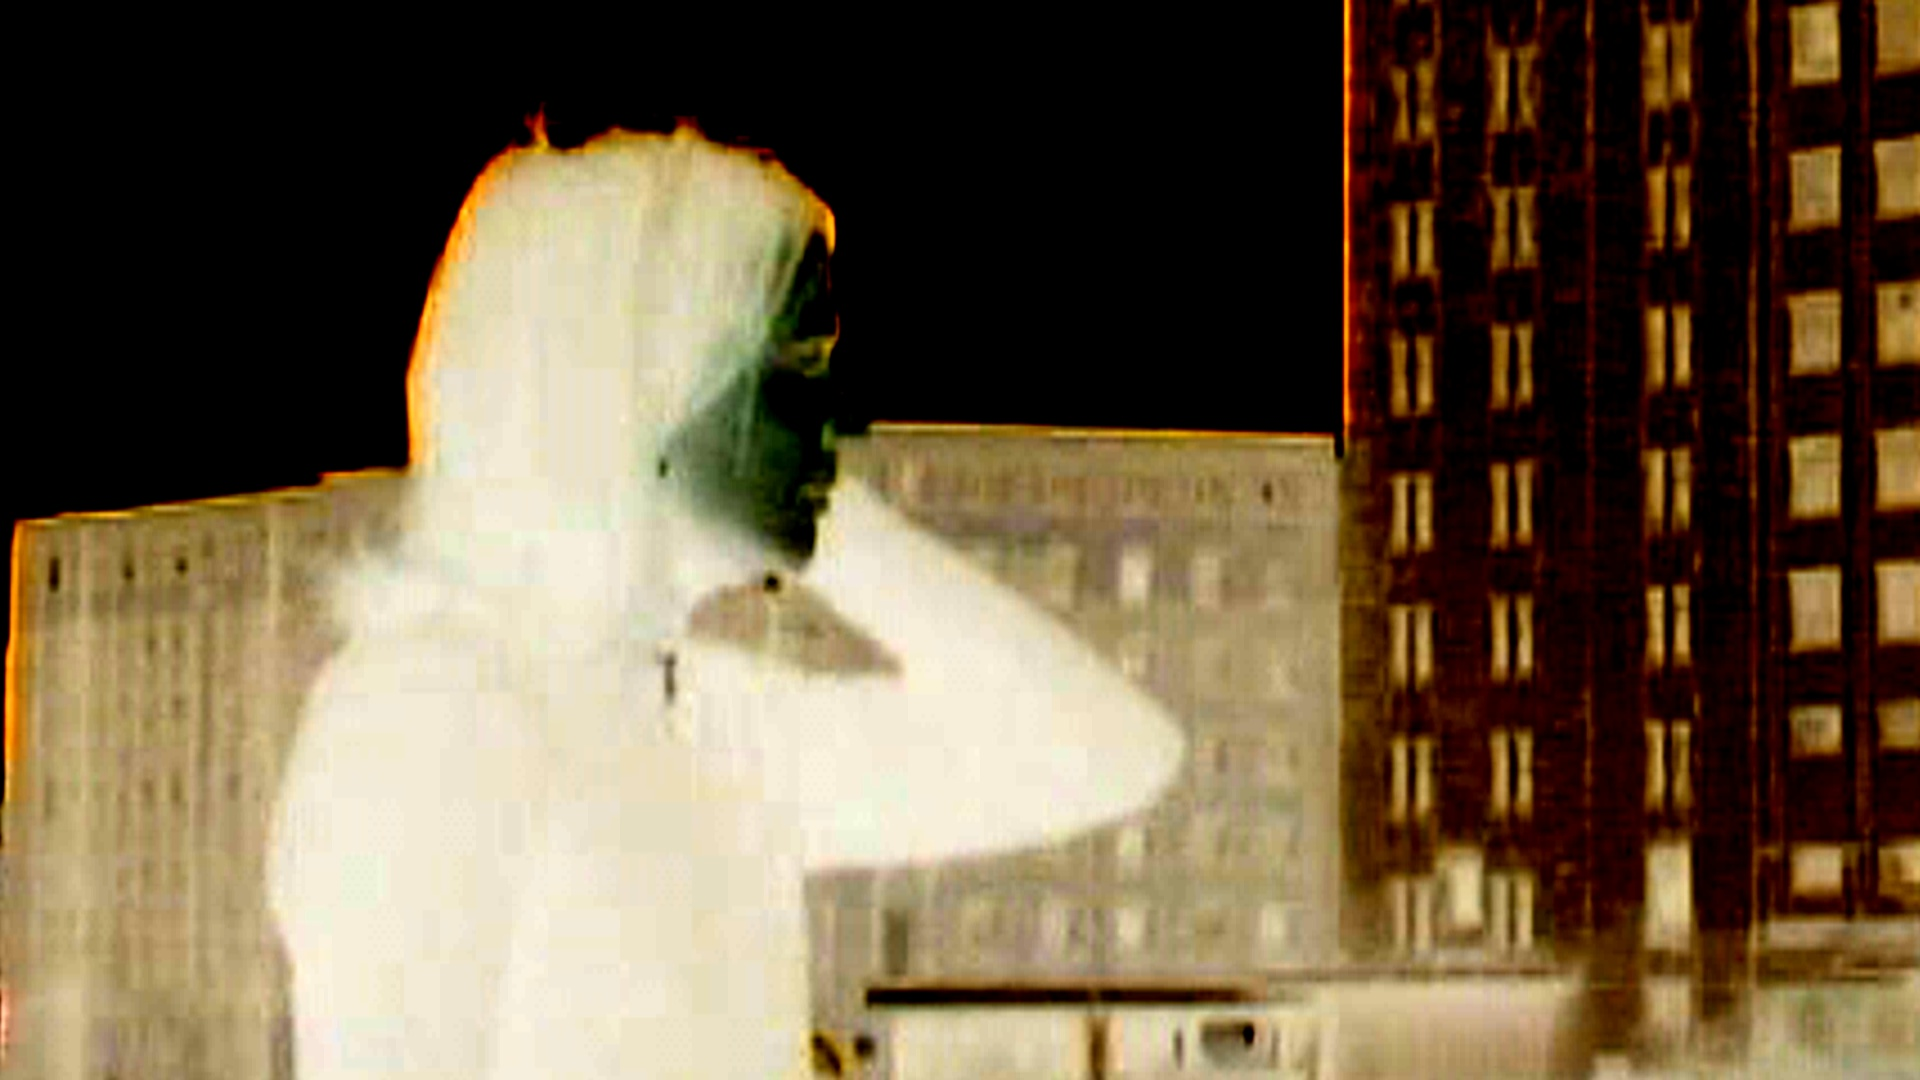 Rohan Quine, 'The Imagination Thief' - film 'MARC 5', still 22